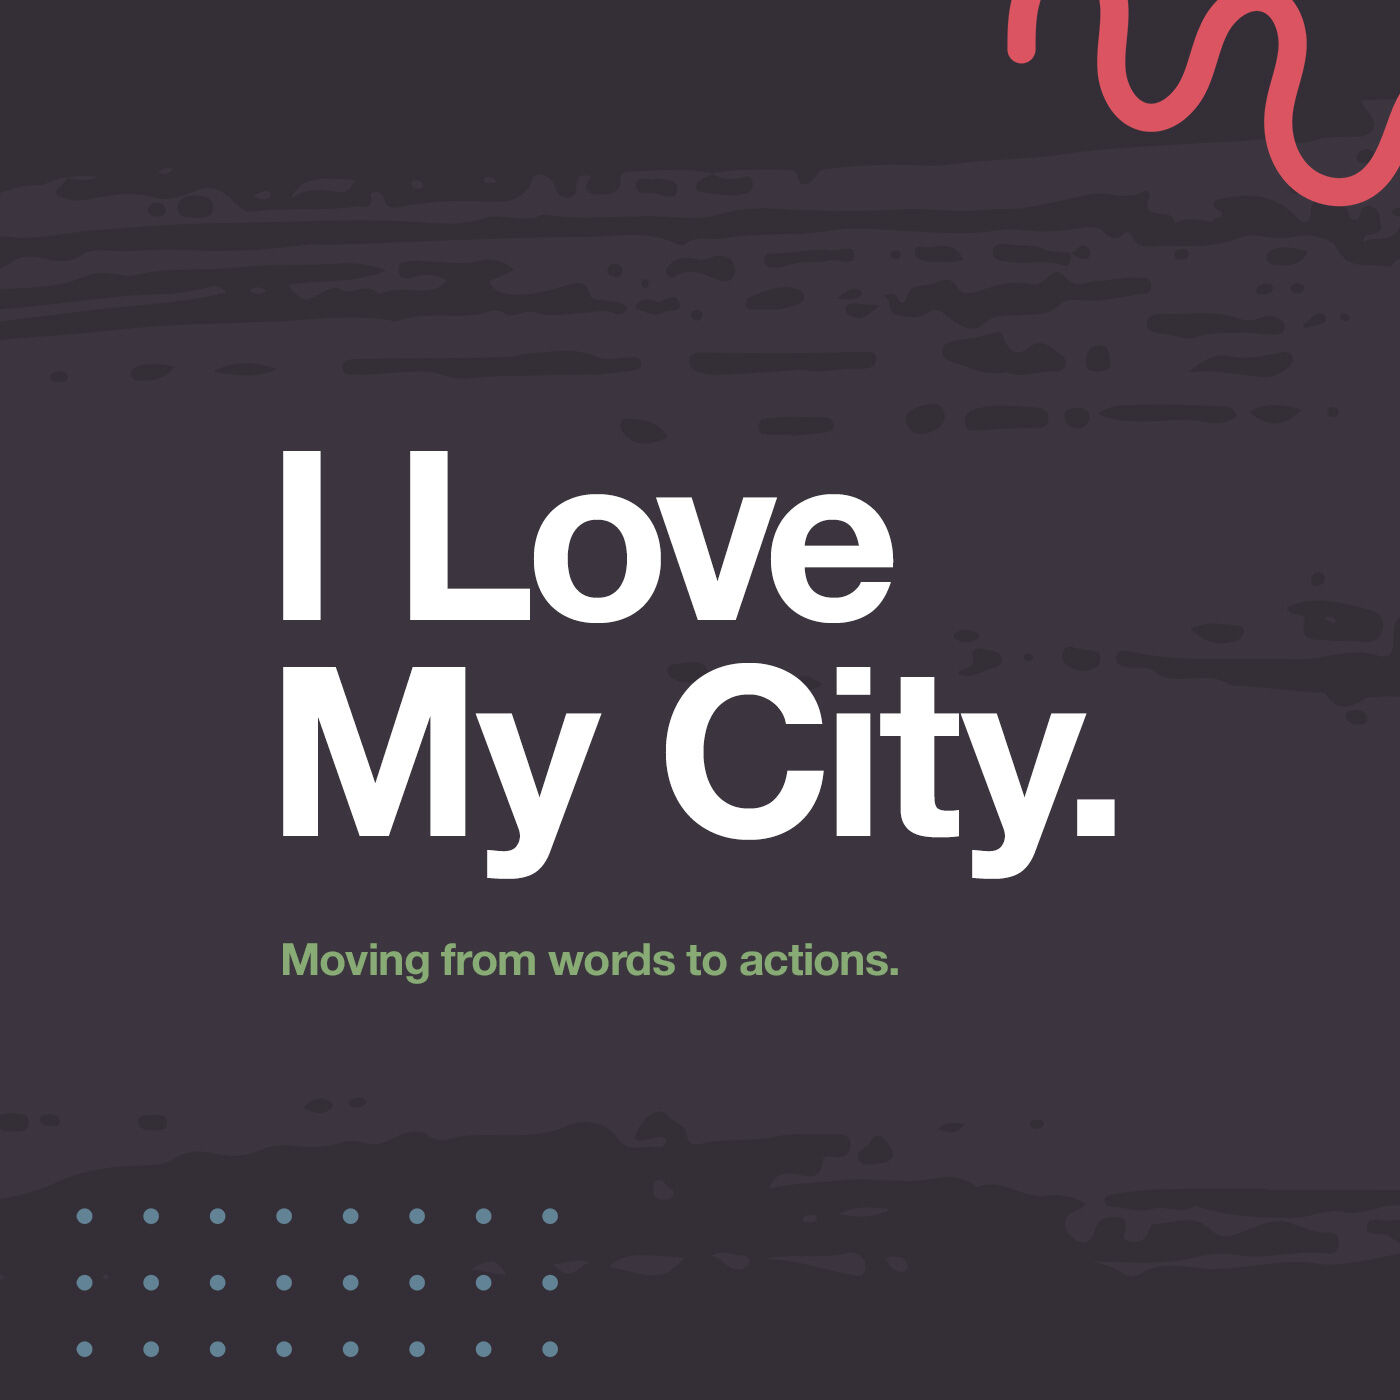 I Love My City 2021, Week 3